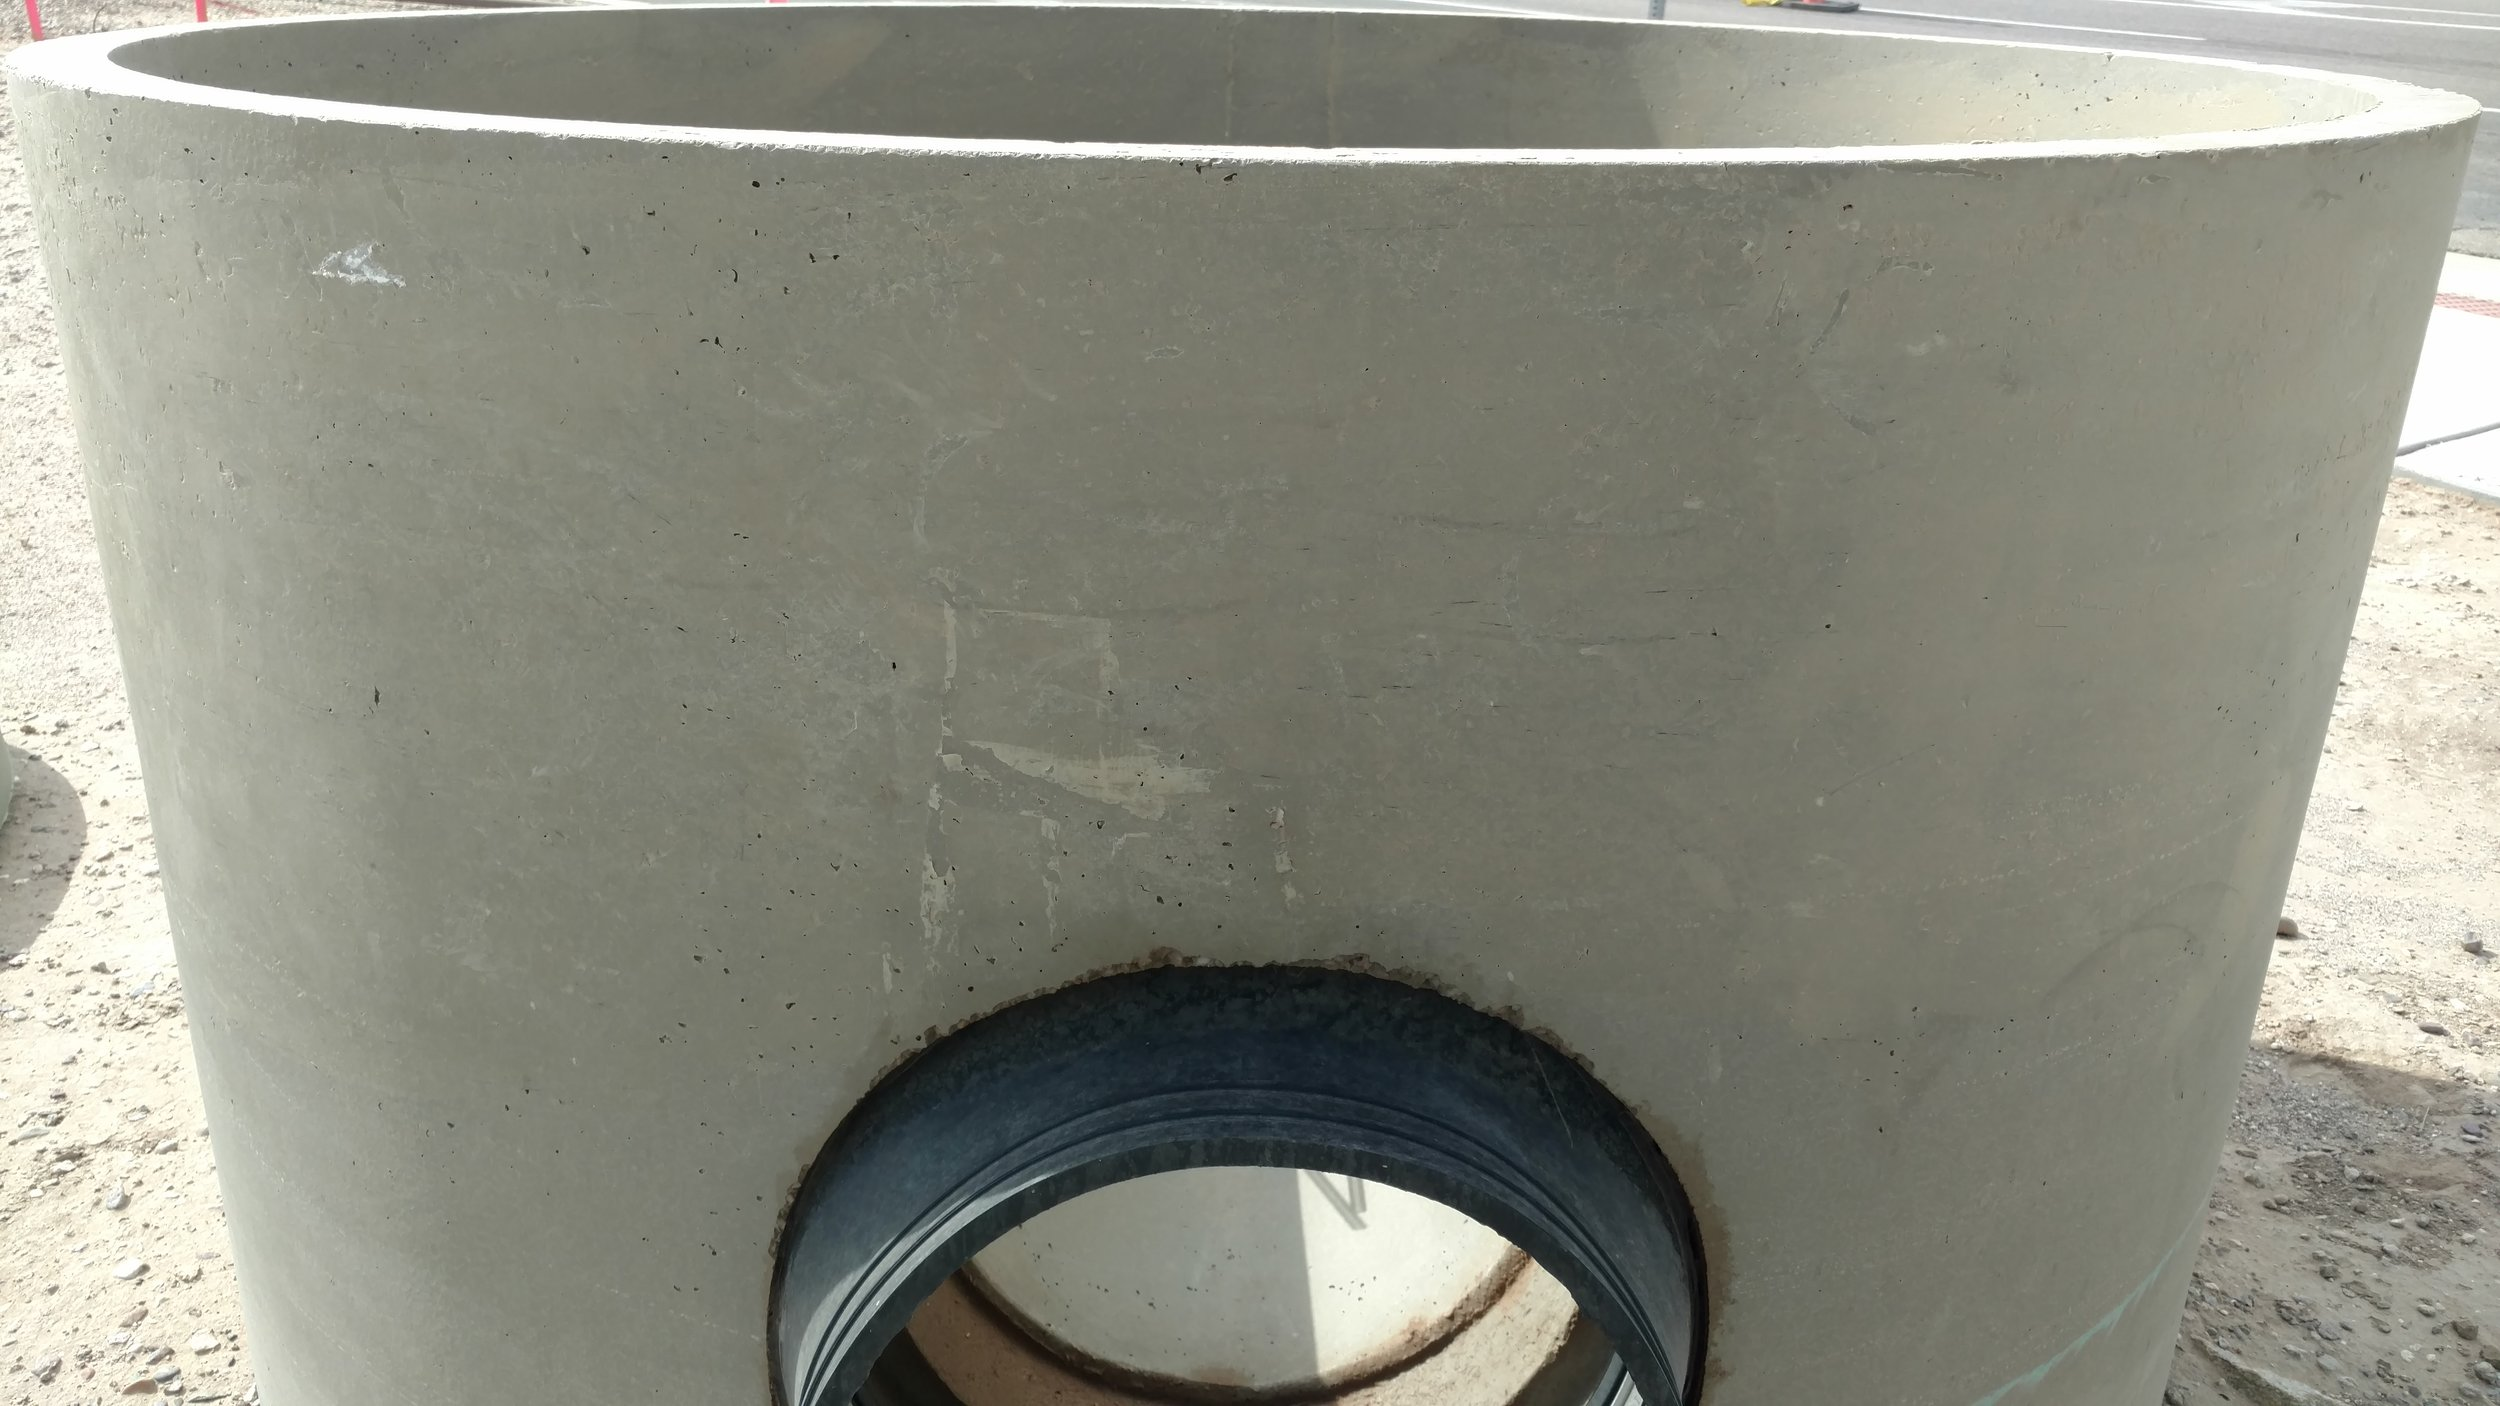 A manhole prior to installation